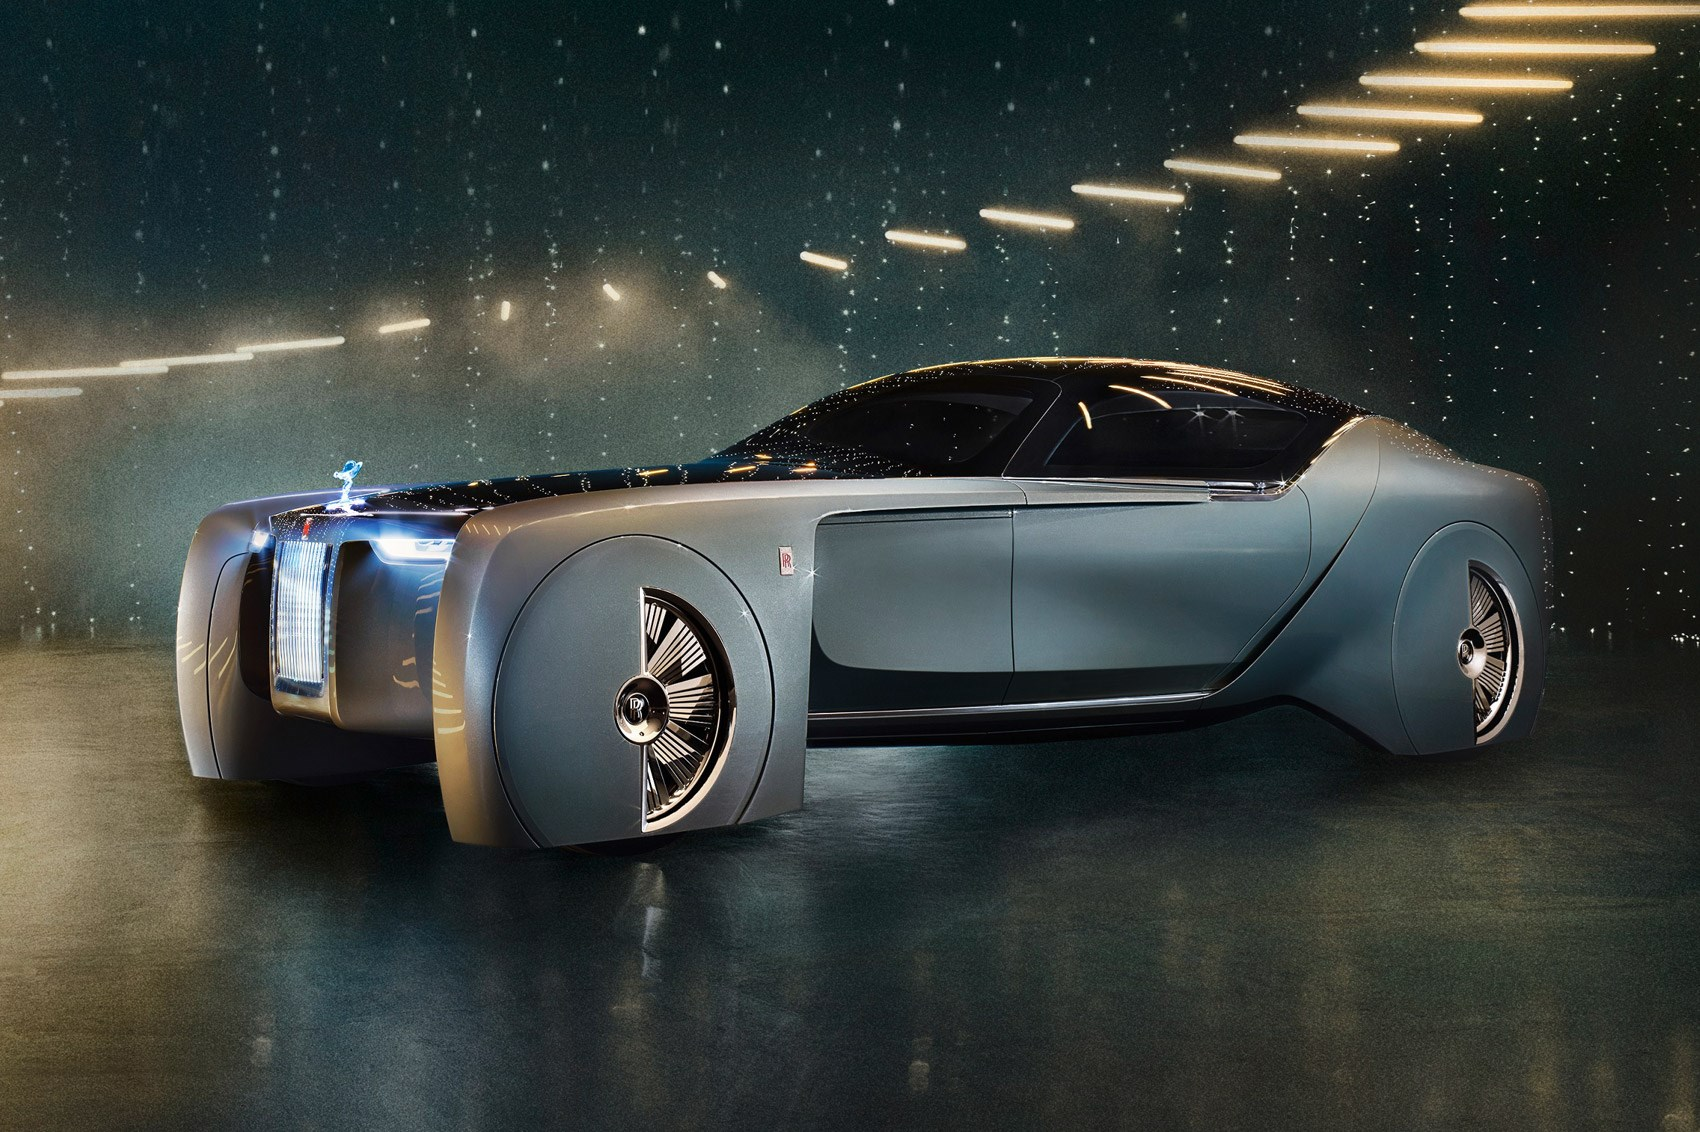 2016 Rolls Royce Vision Next 100 Concept